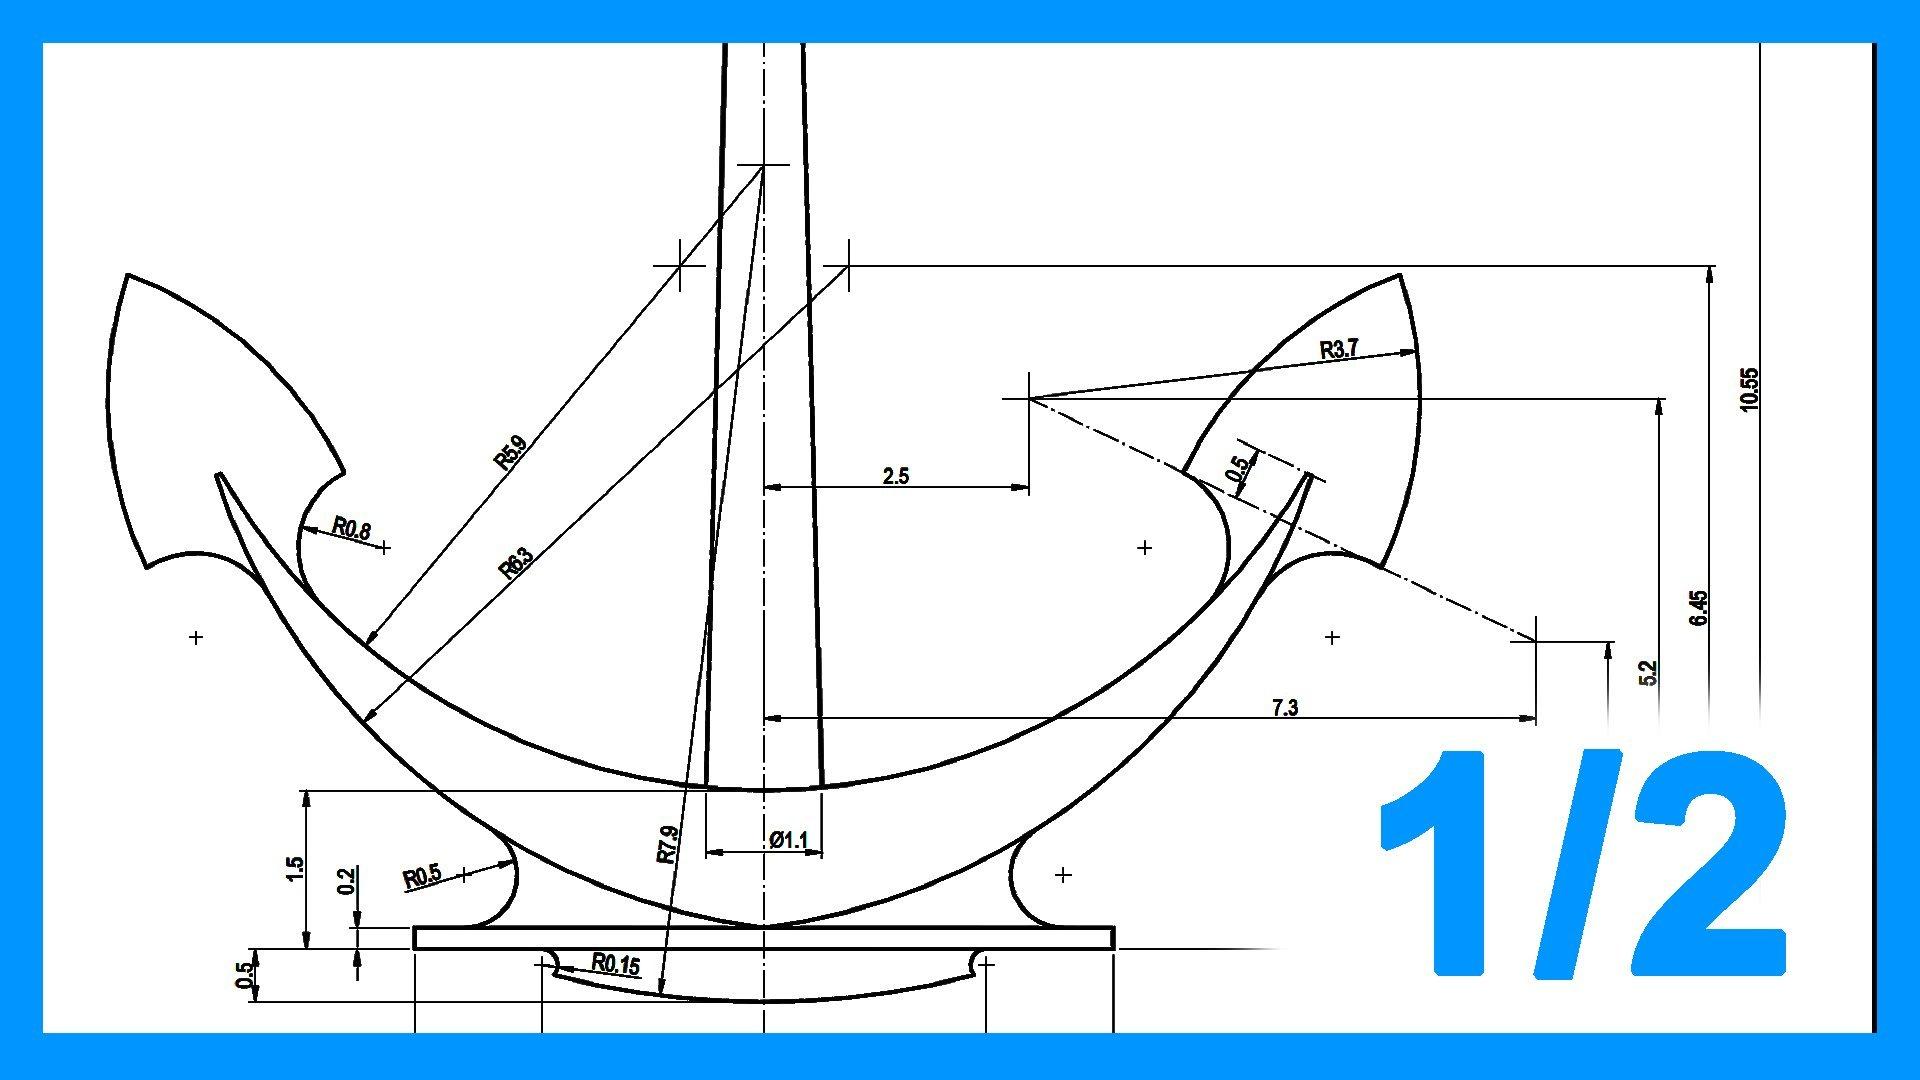 Autocad – 1/2 Ejercicio paso a paso dibujando Ancla 2D. Práctica 2D Autocad.